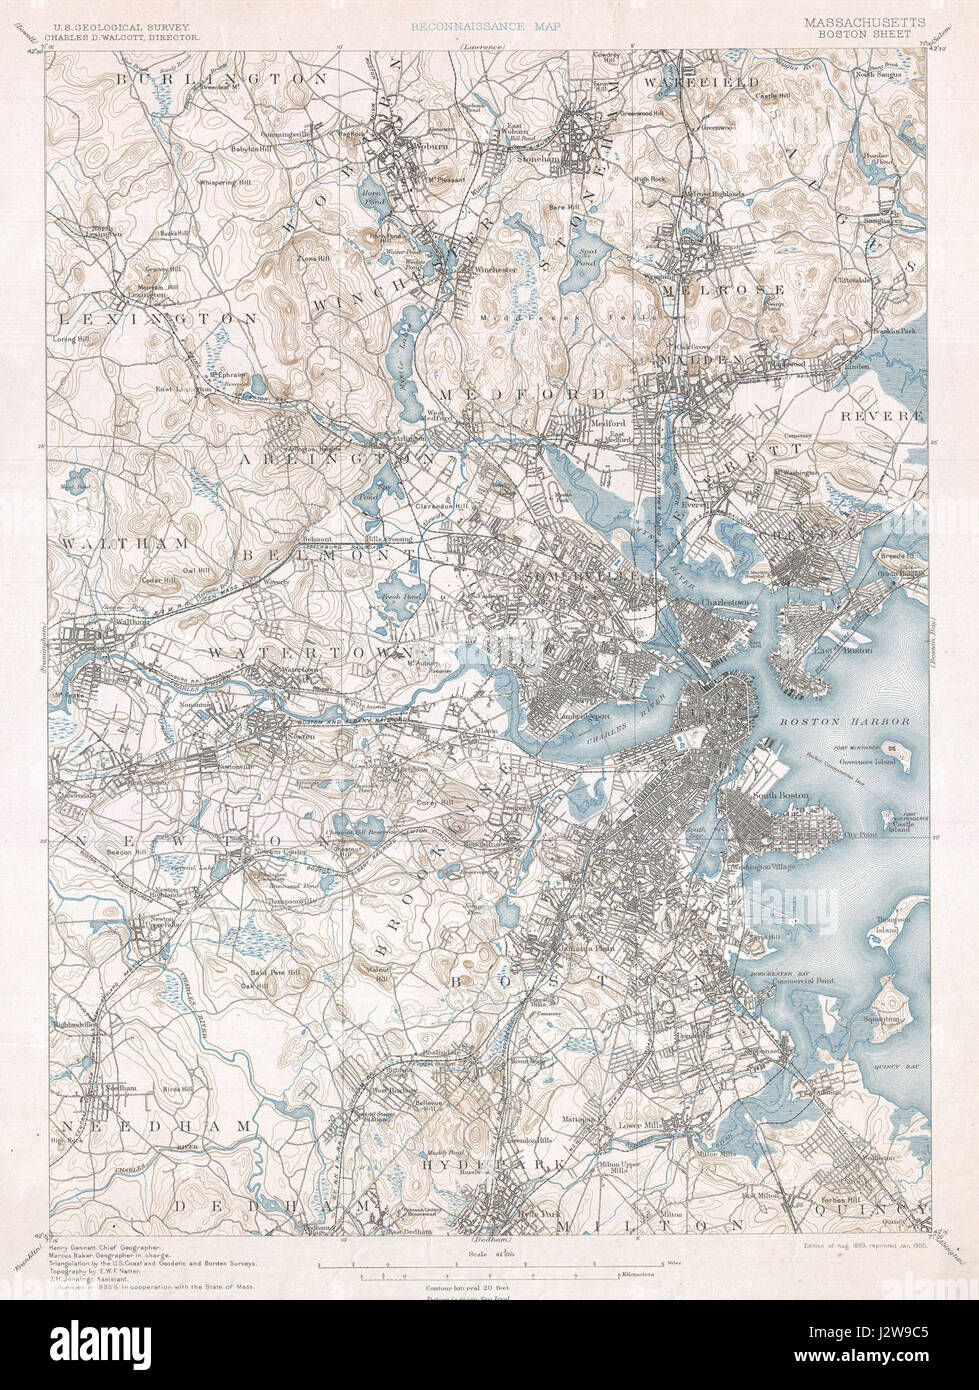 1900 U.S. Geological Survey of Boston and Vicinity, Massachusetts - Geographicus - Boston-USGS-1900 - Stock Image